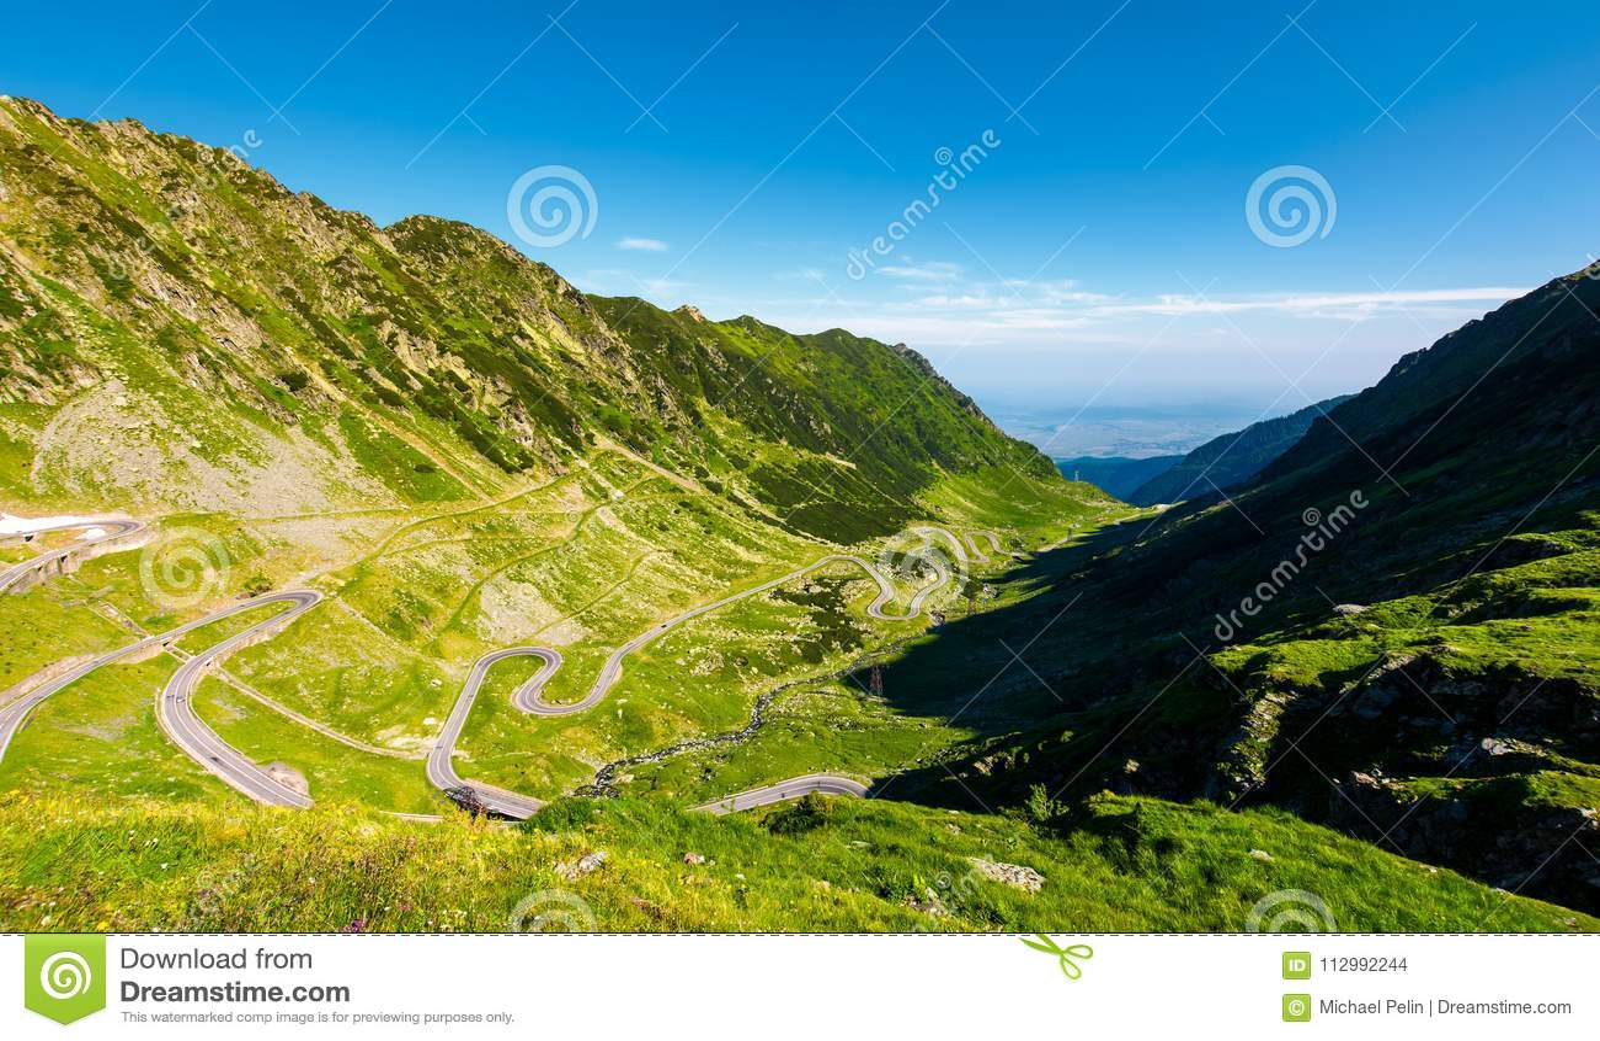 Transfagarasan road in mountains of Romania